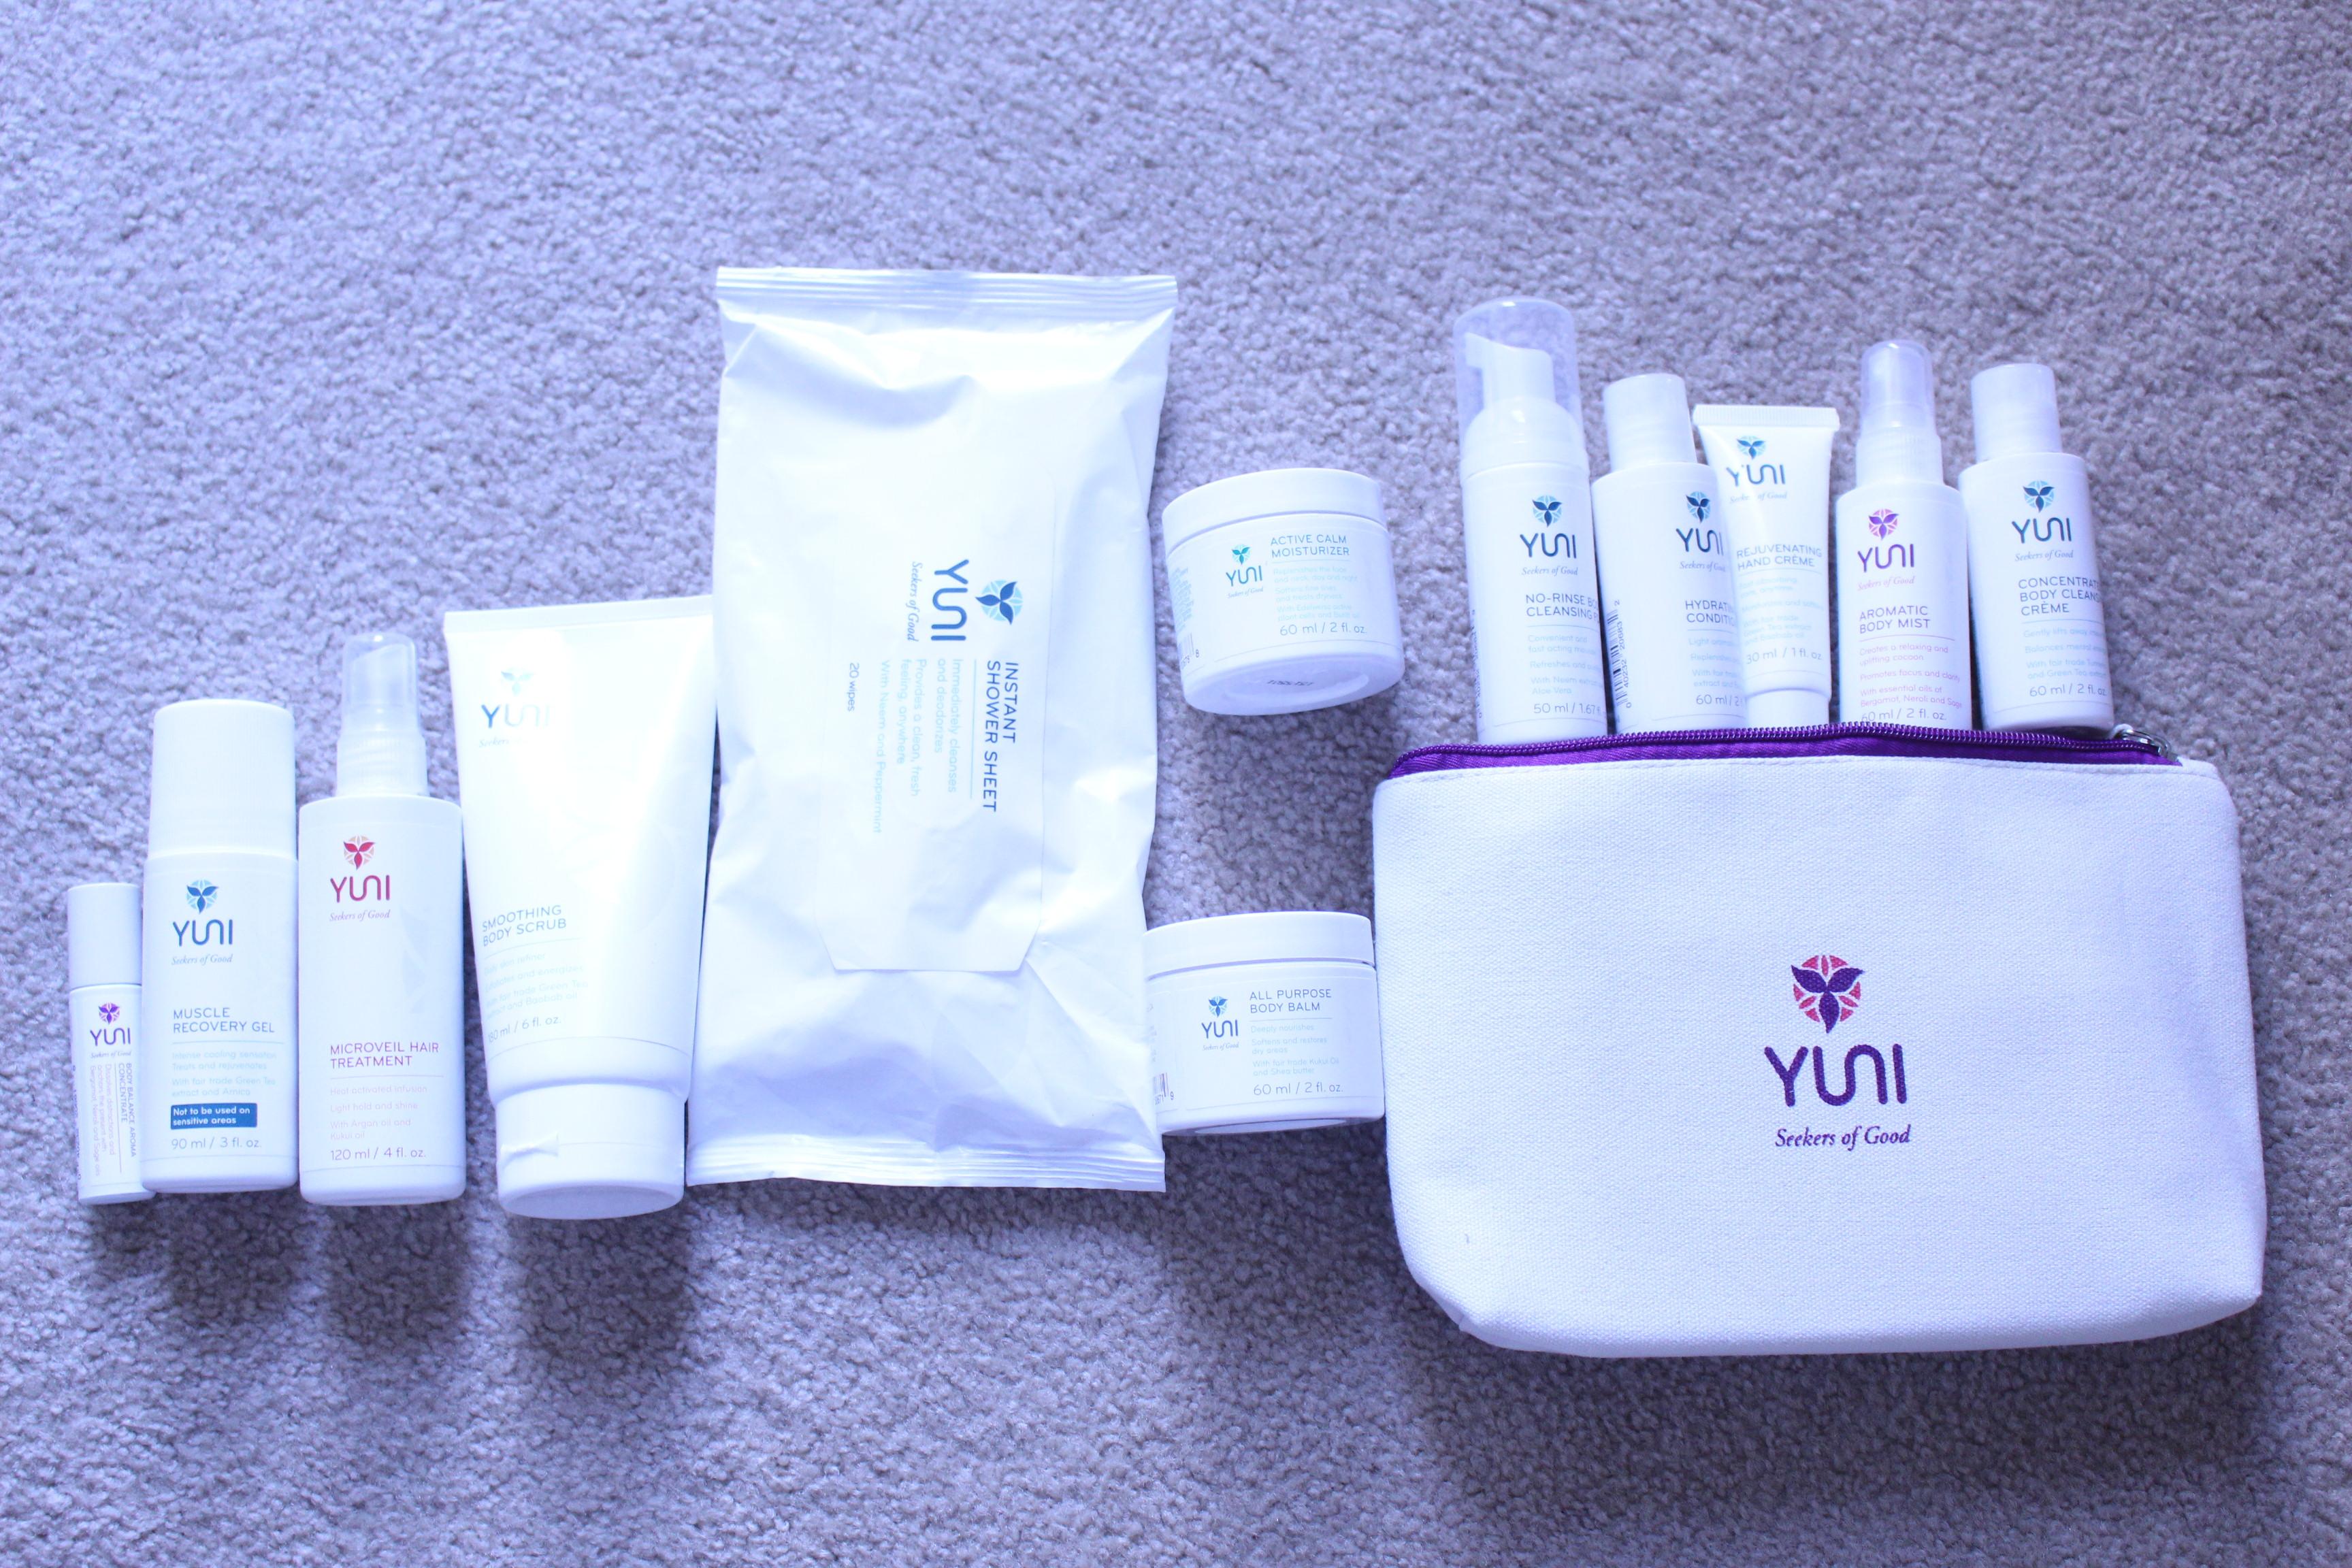 Yuni Beauty Products